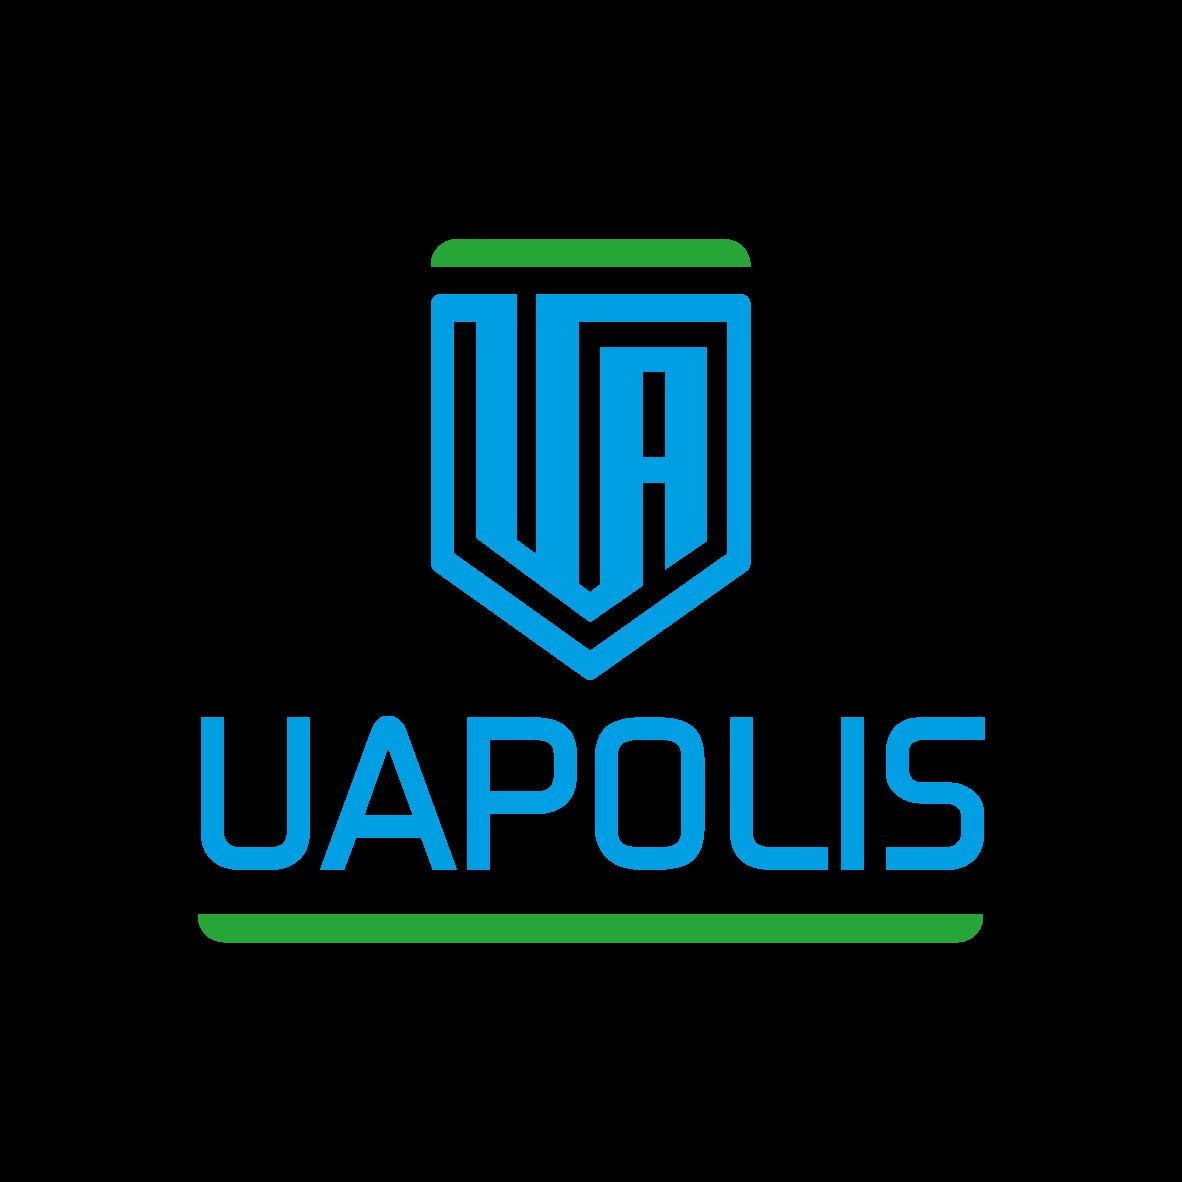 UAPOLIS